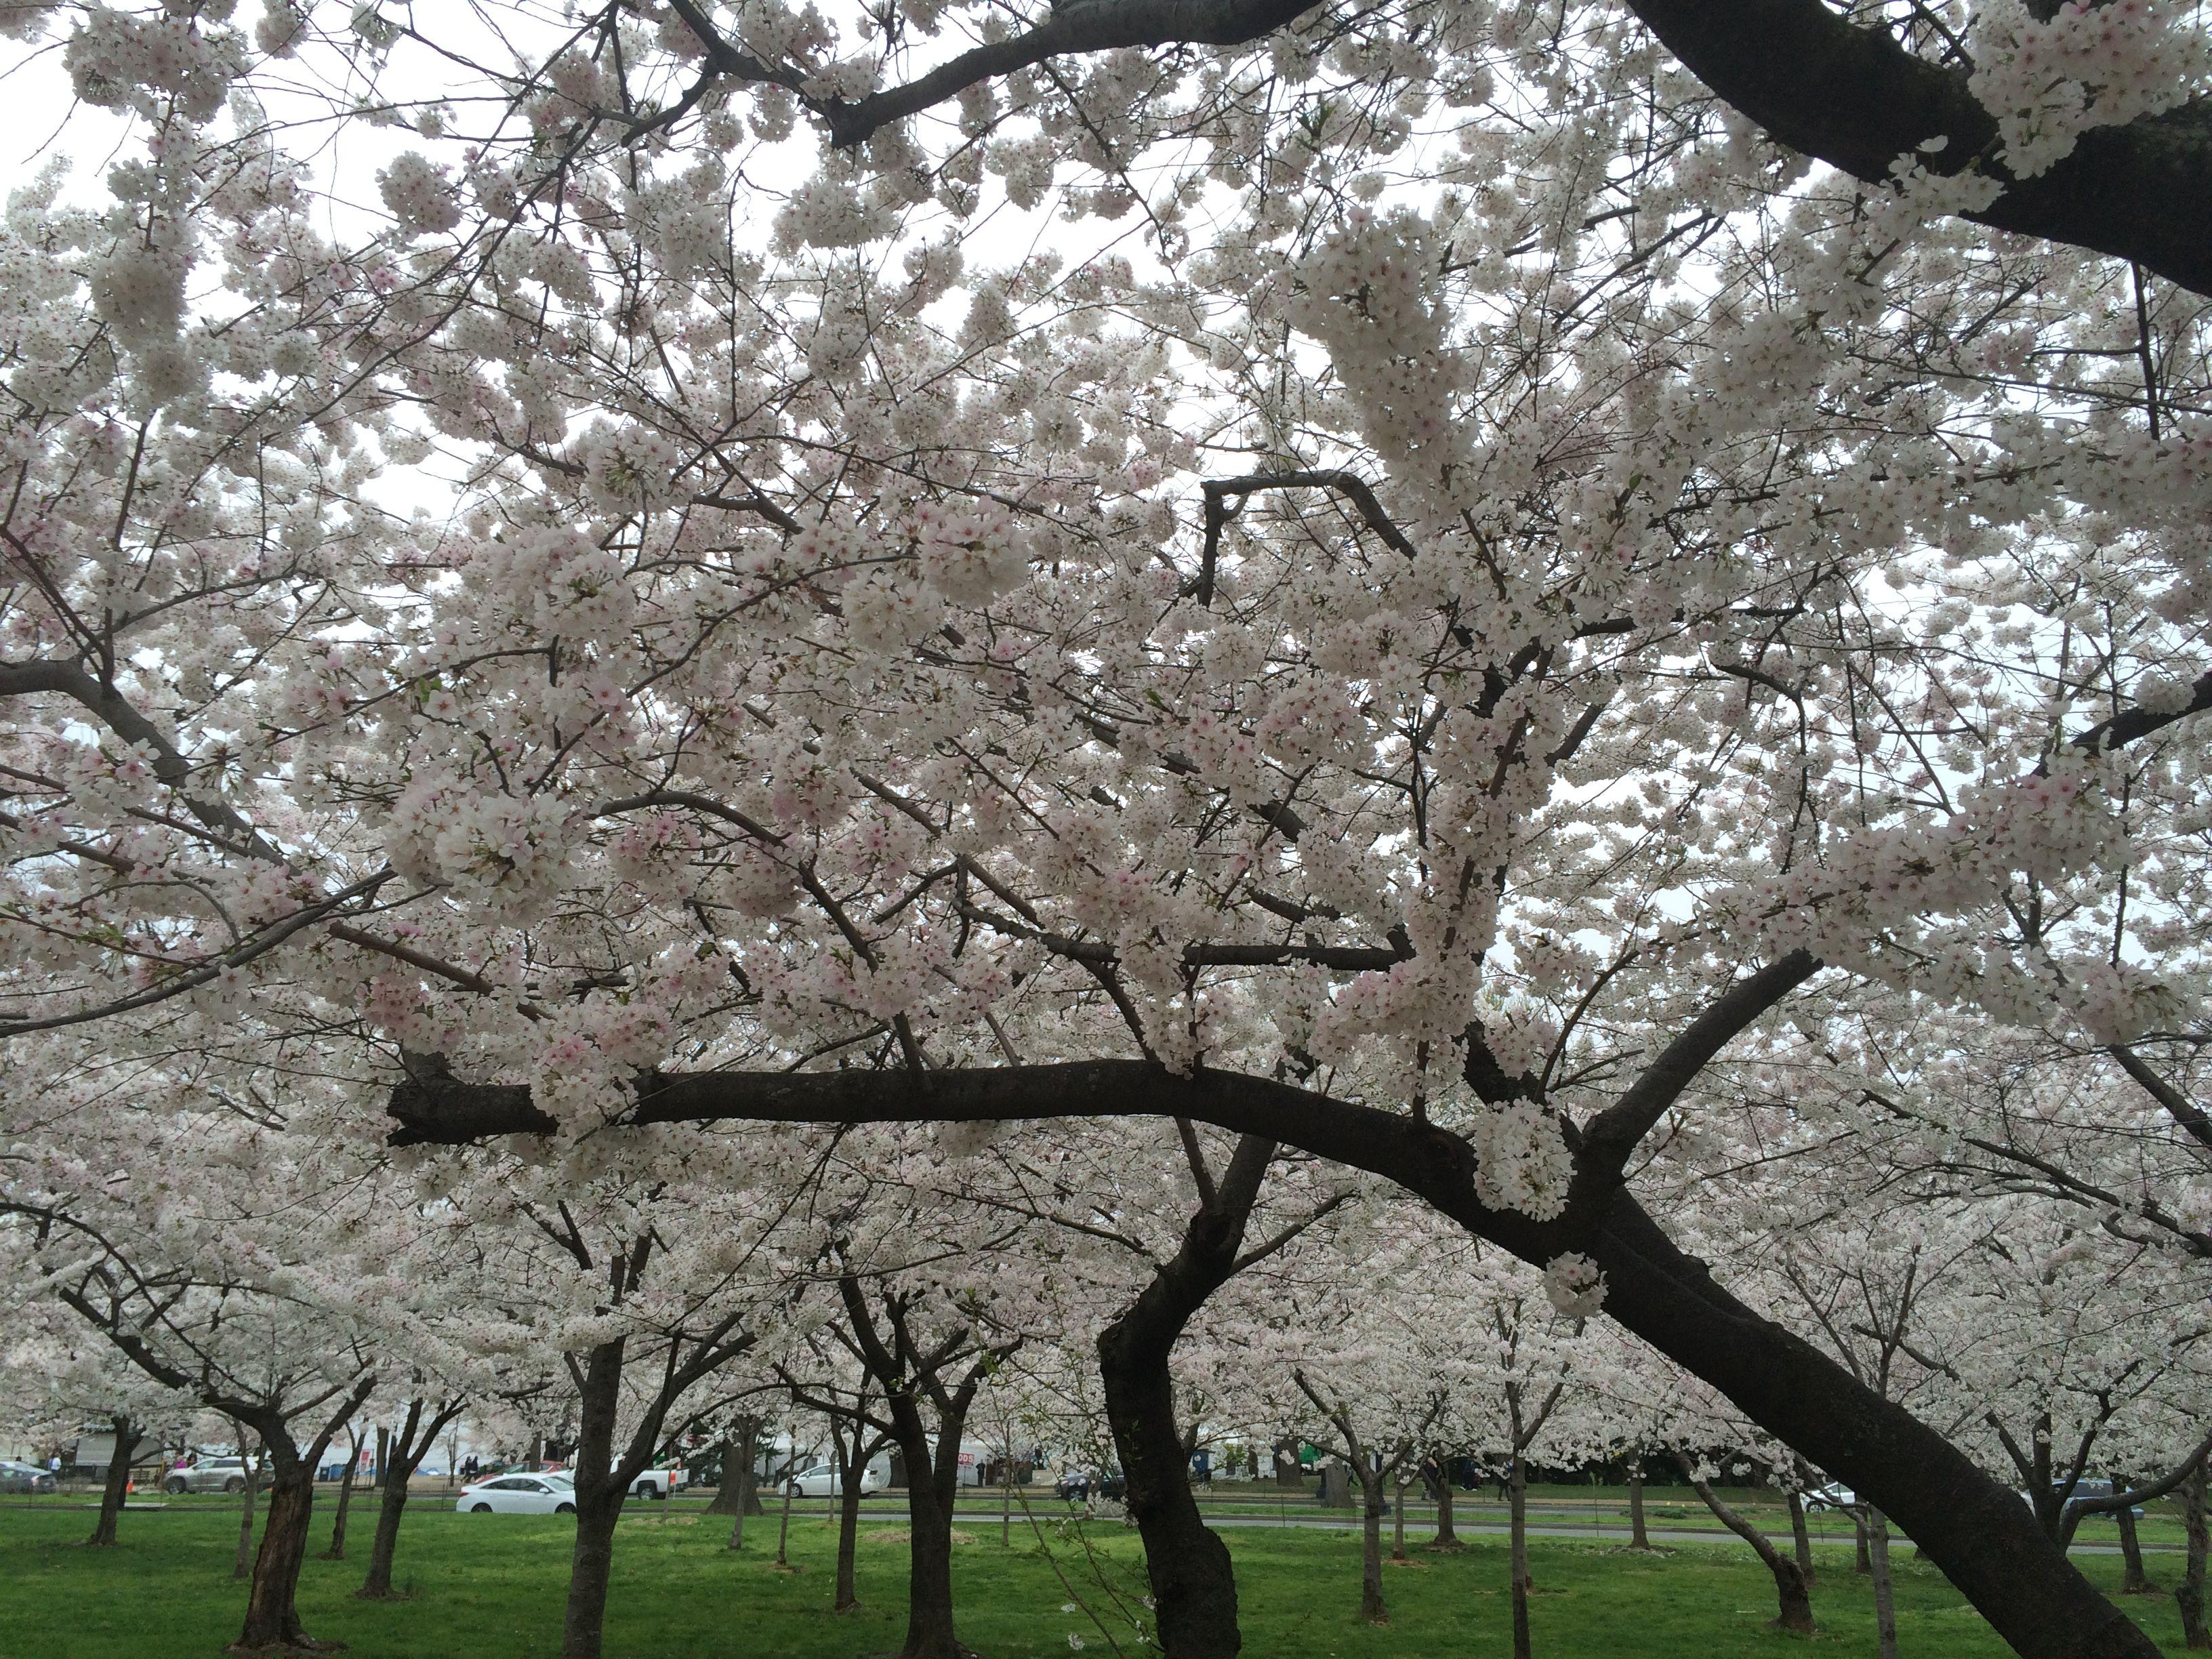 Field Of Cherry Blossom Trees In Washington Dc Eslkidz Cherryblossom Spring Washingtondc Cherry Blossom Tree Spring Tree